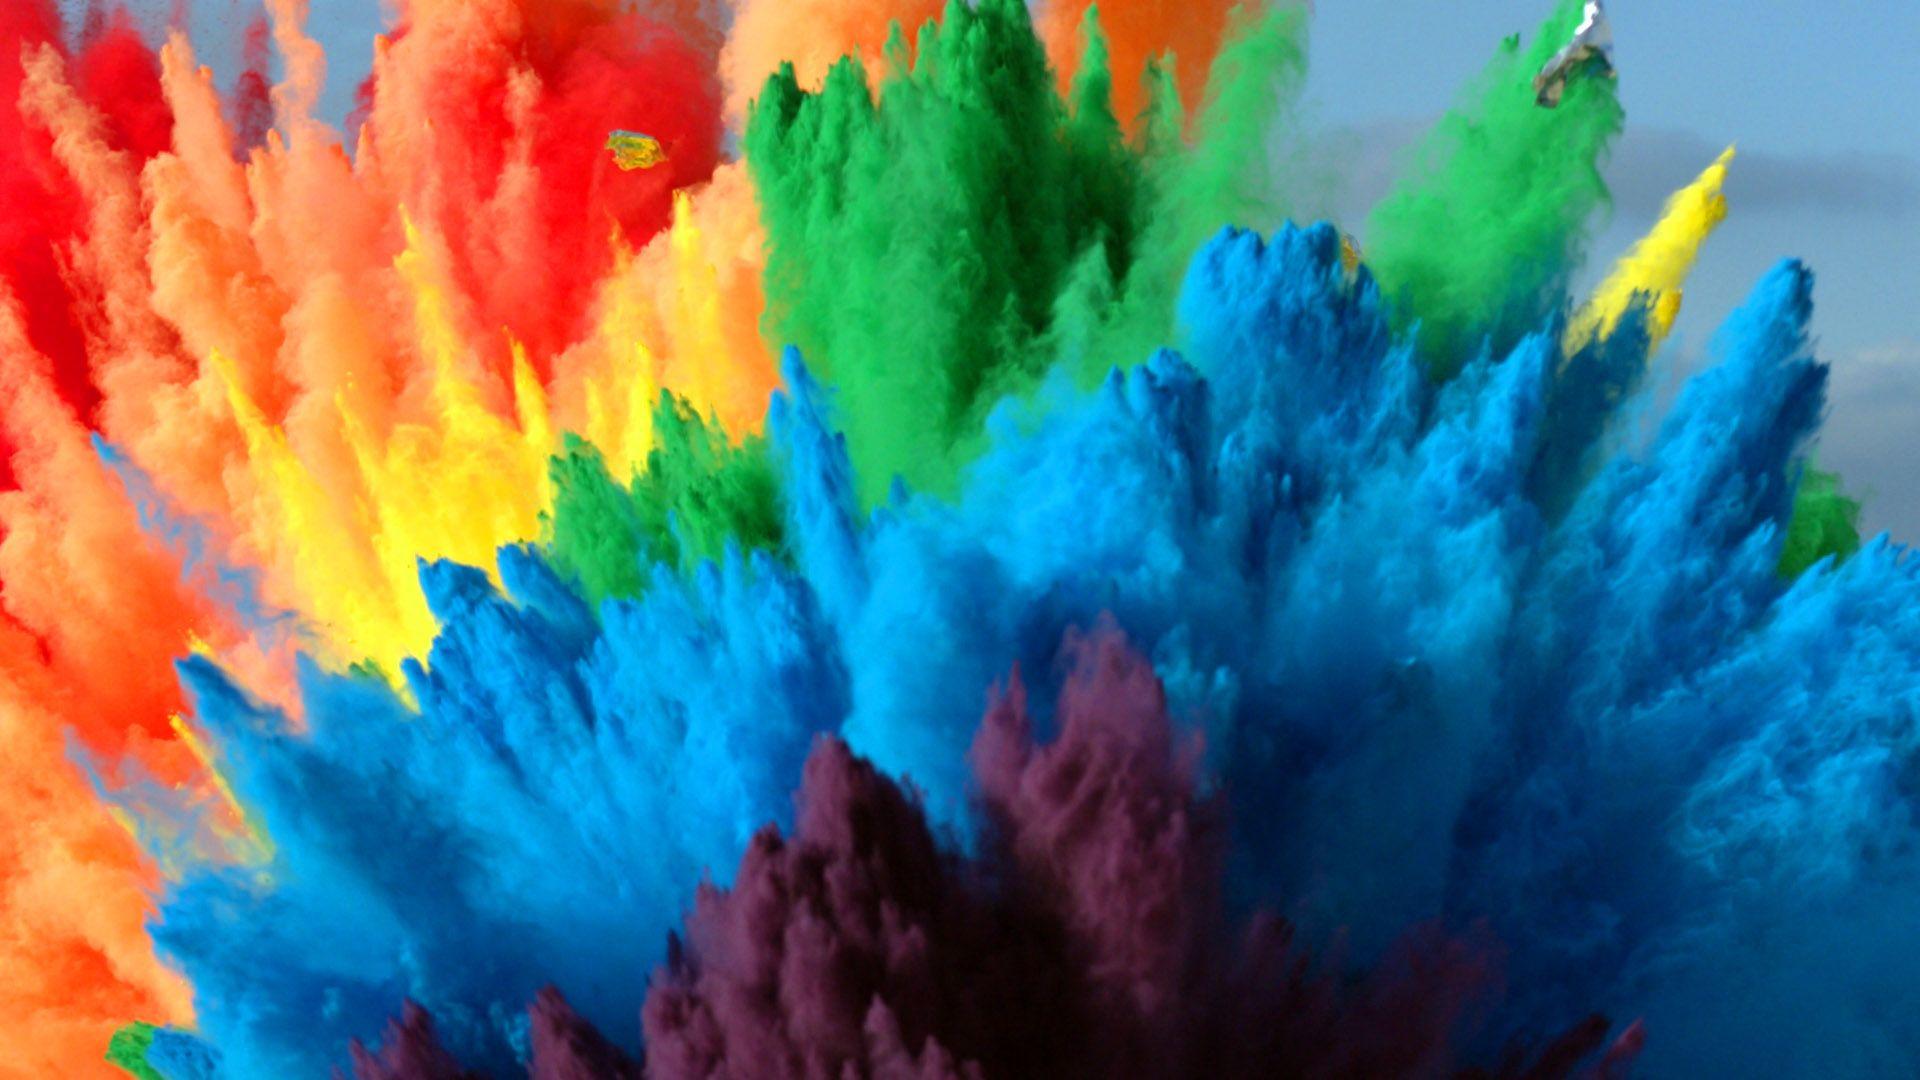 Rainbow 1080p Wallpaper